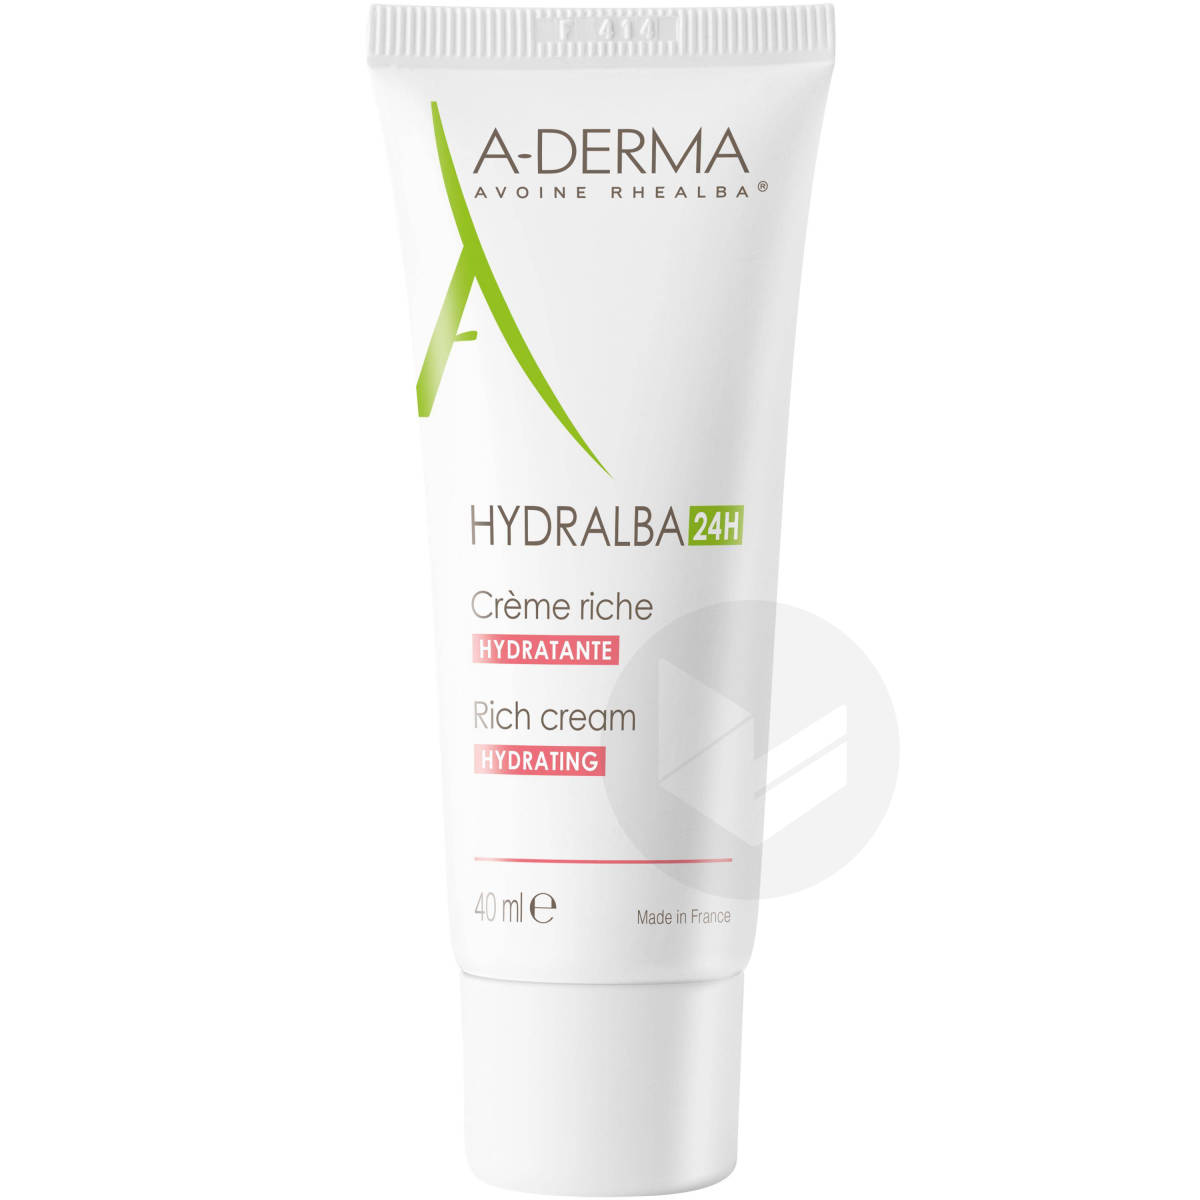 Crème visage riche hydratante 40ml